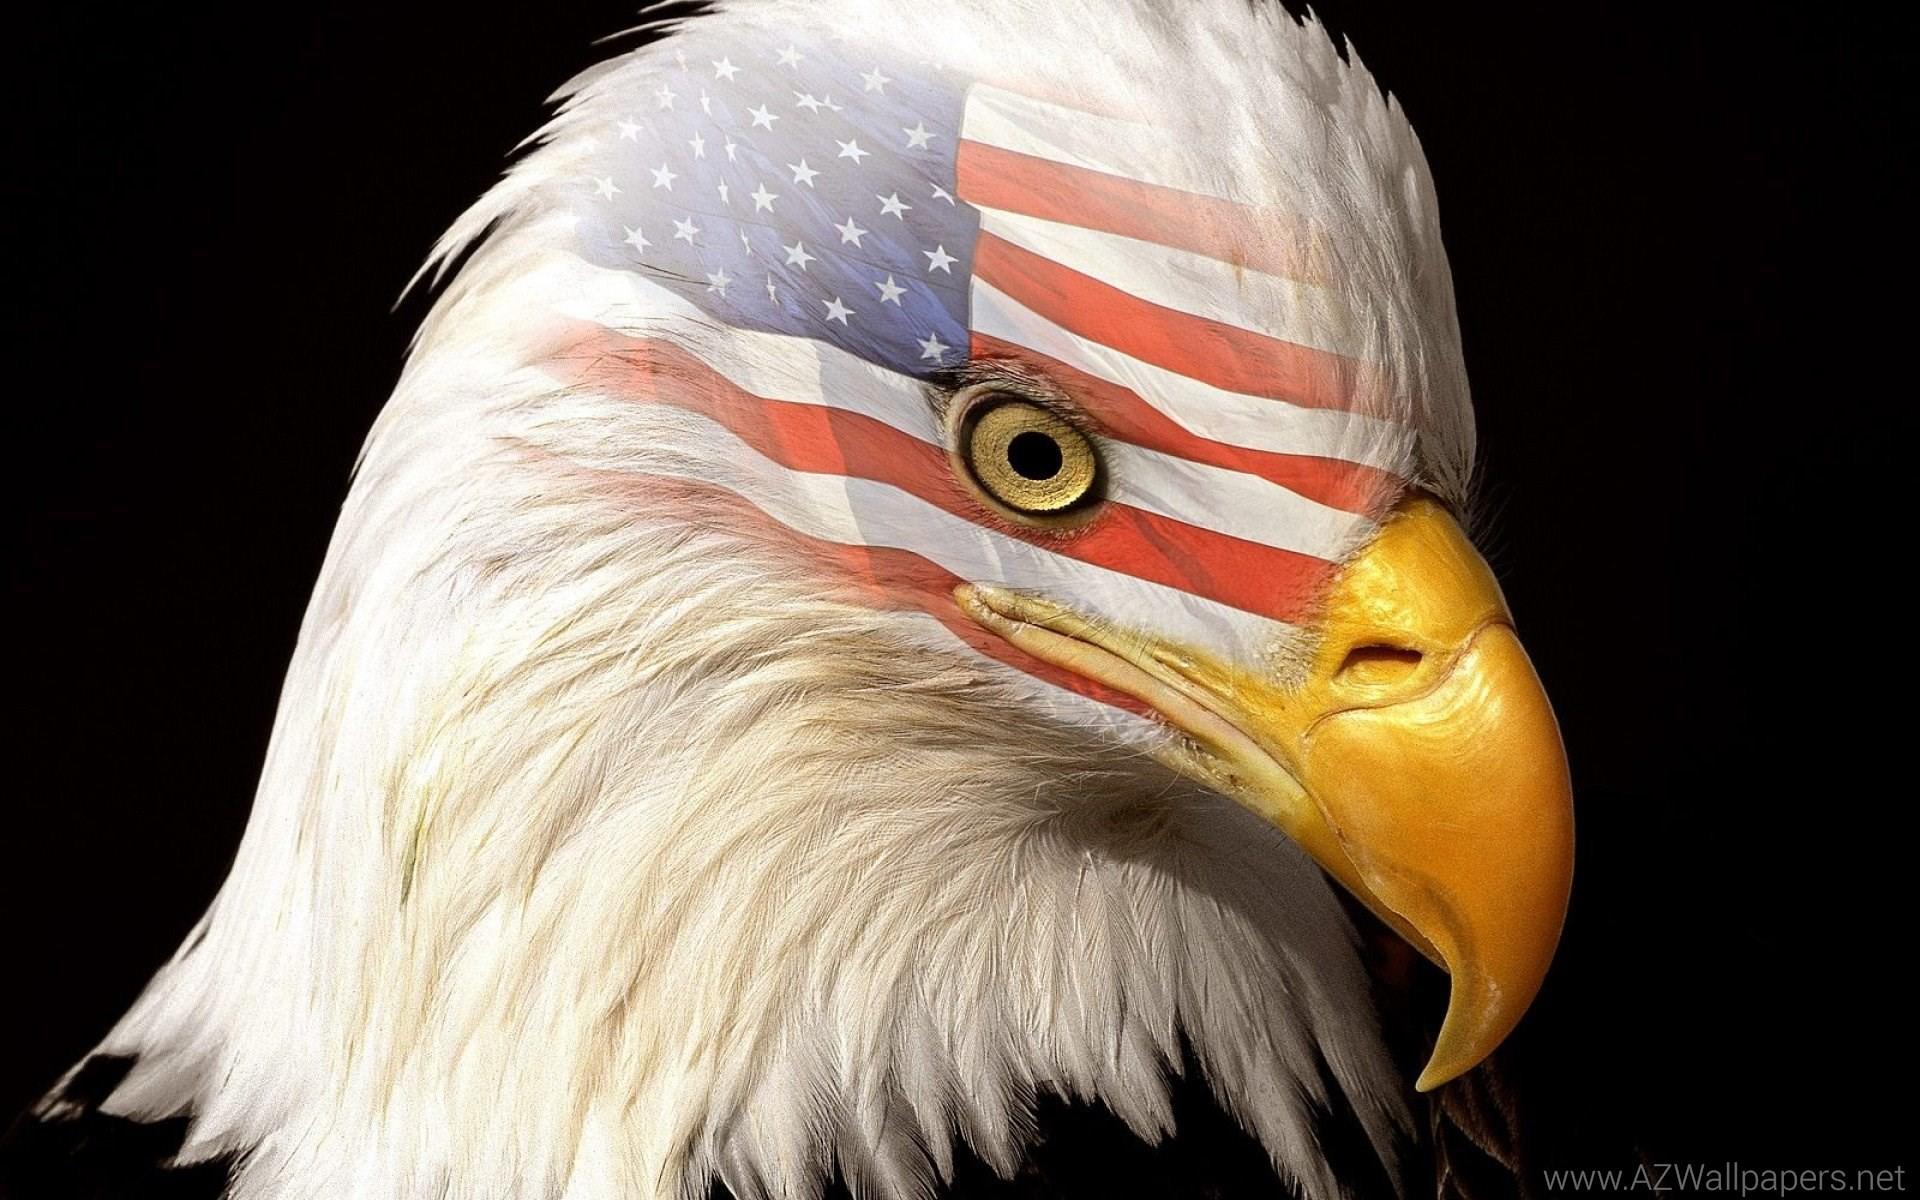 Patriotic Wallpaper Usa Flag Eagle: Patriotic Eagle Wallpapers (61+ Images